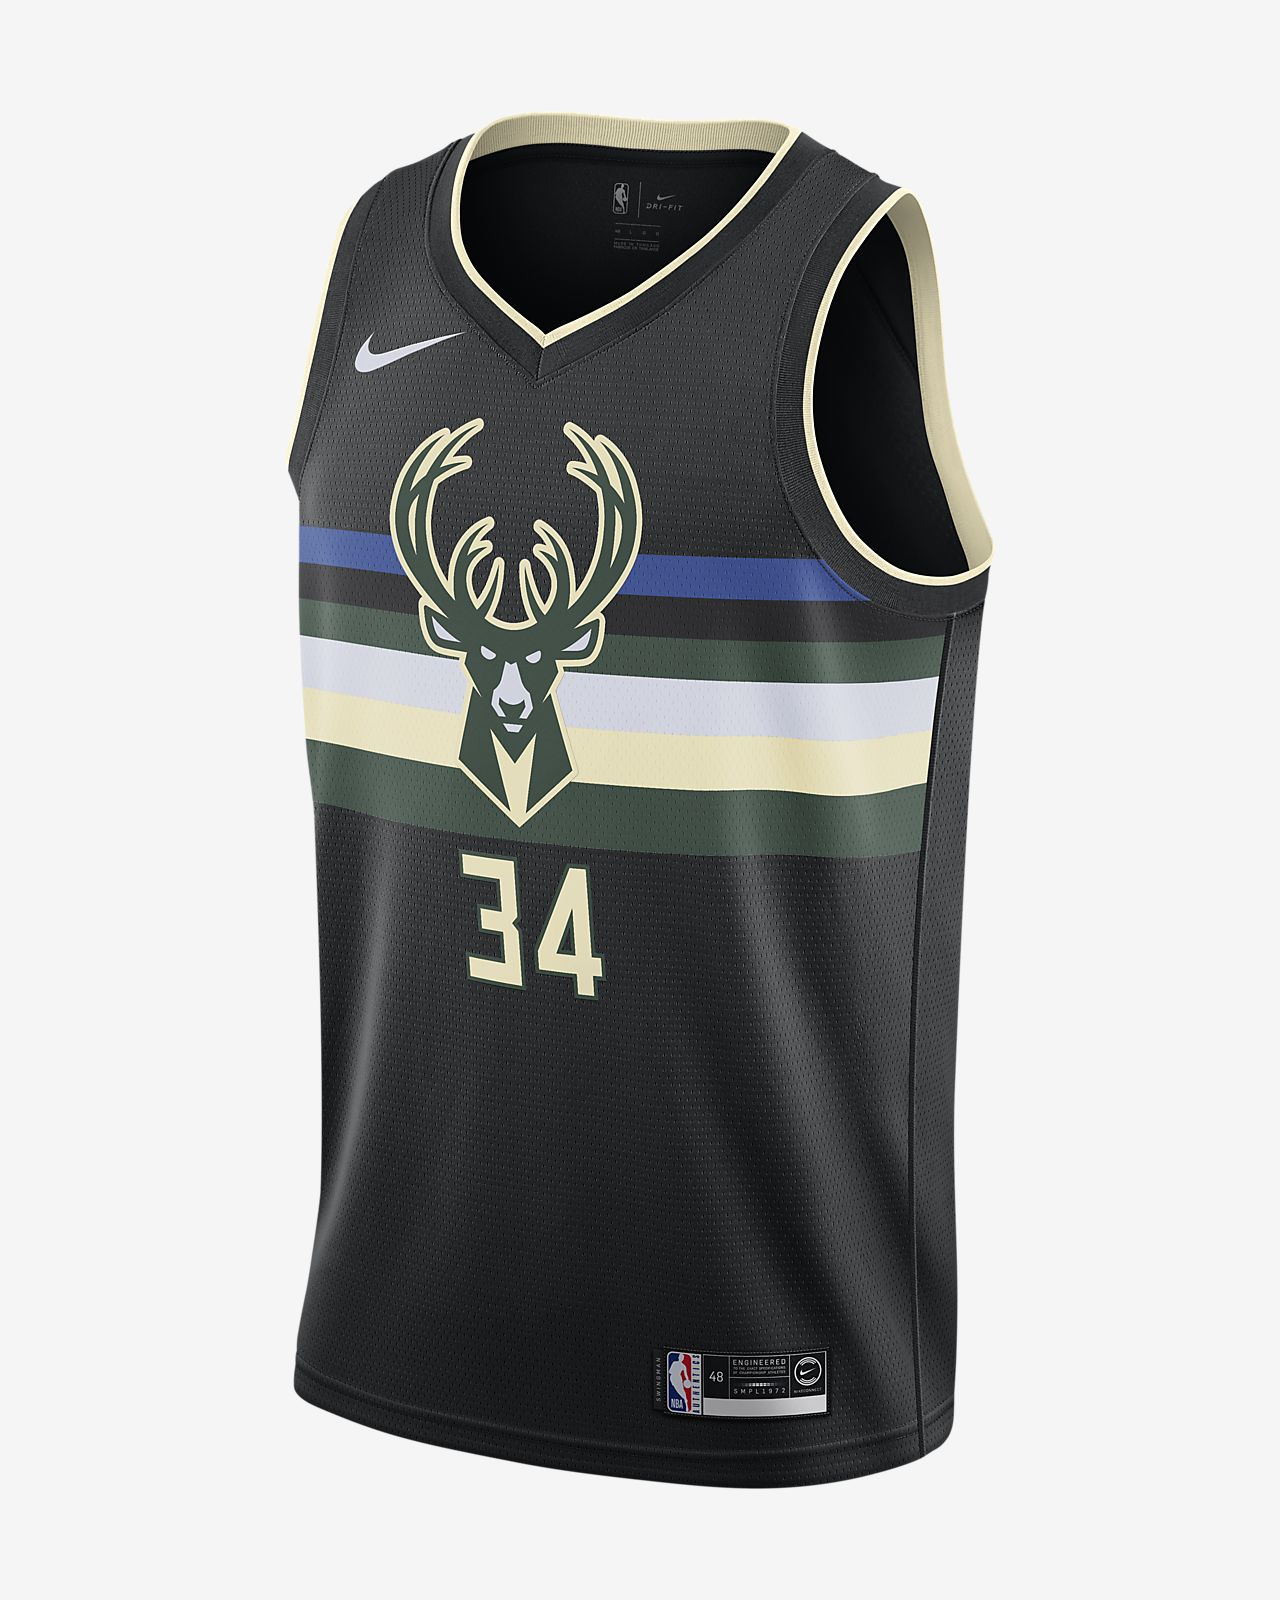 Maillot Nike NBA Swingman Giannis Antetokounmpo Bucks Statement Edition